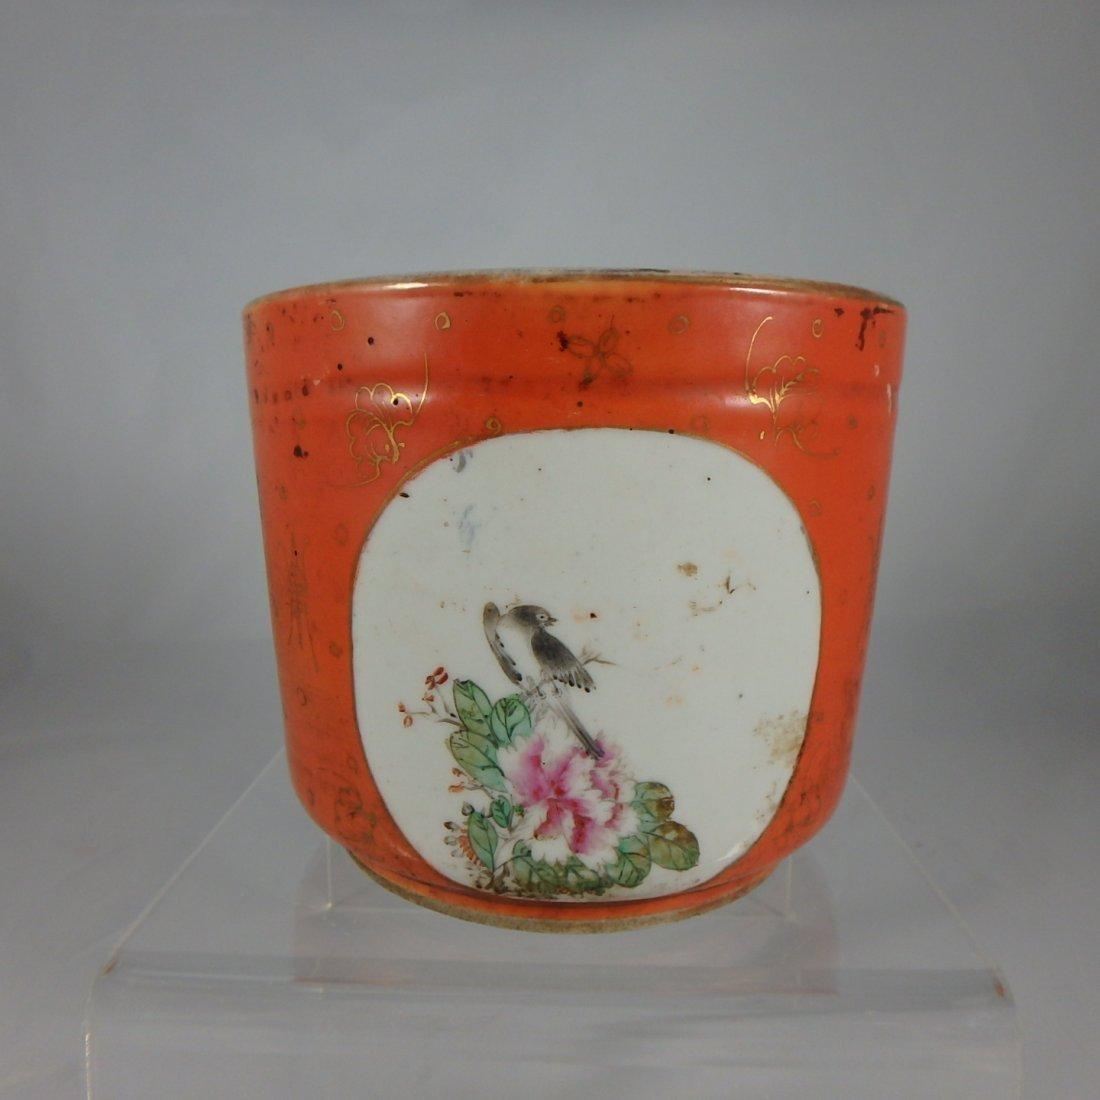 Chinese Qing Dynasty Porcelain Censer